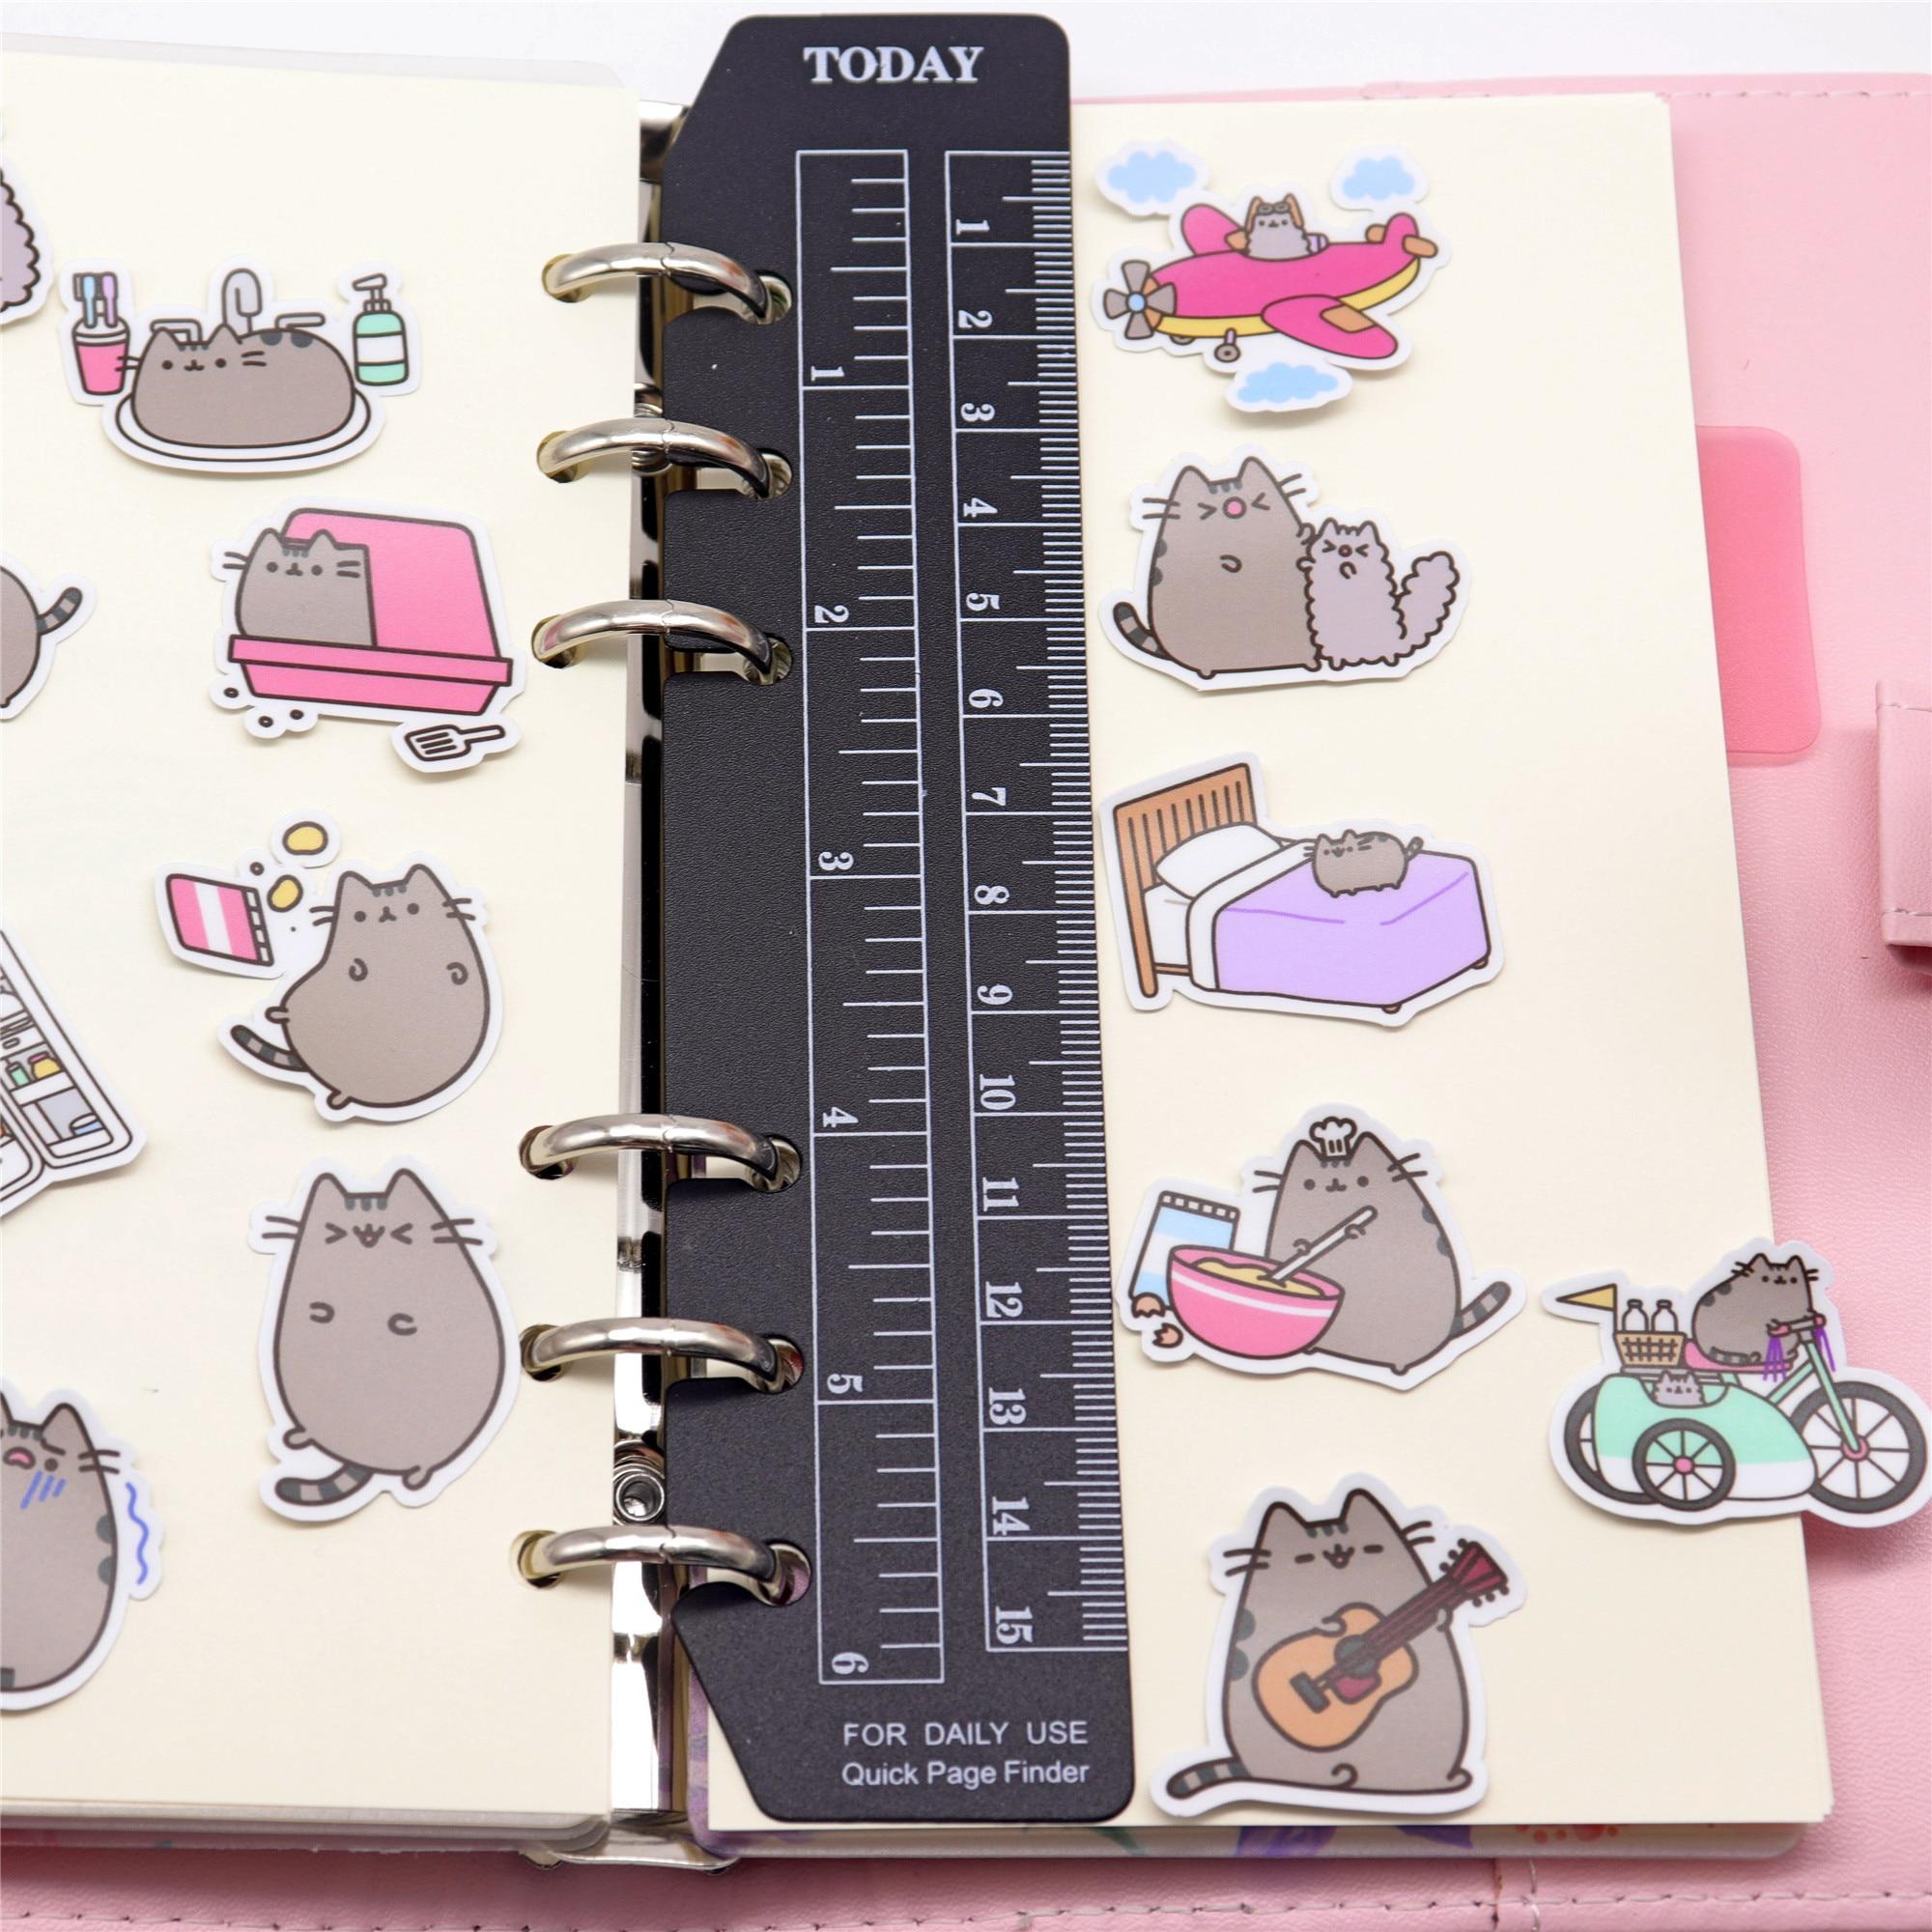 Купить с кэшбэком 39pcs Creative cute self-made fat cat sticker scrapbooking stickers /decorative sticker /DIY craft photo albums Waterproof